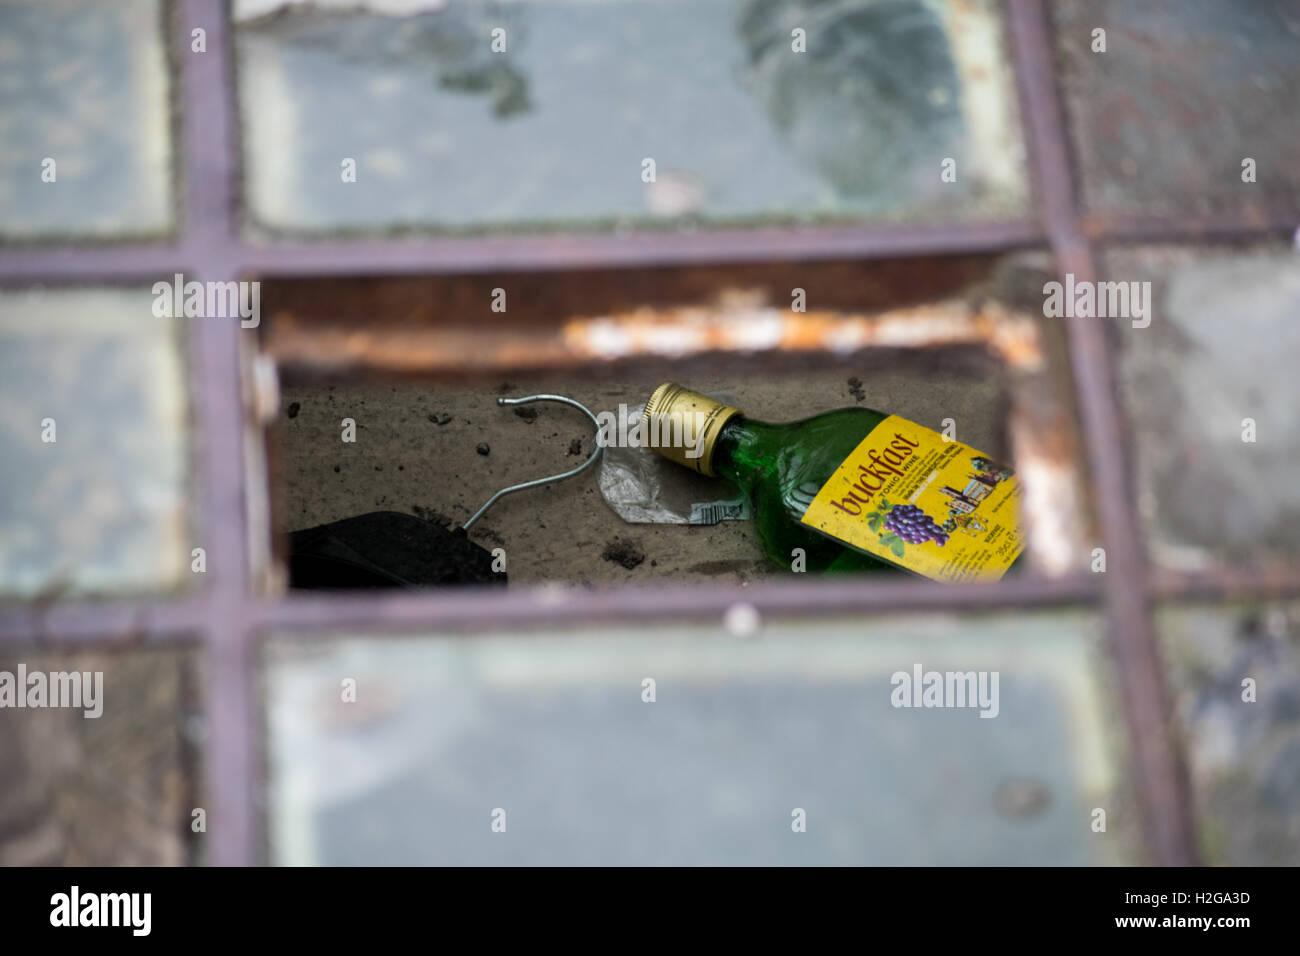 Street images from around Glasgow Scotland - Stock Image